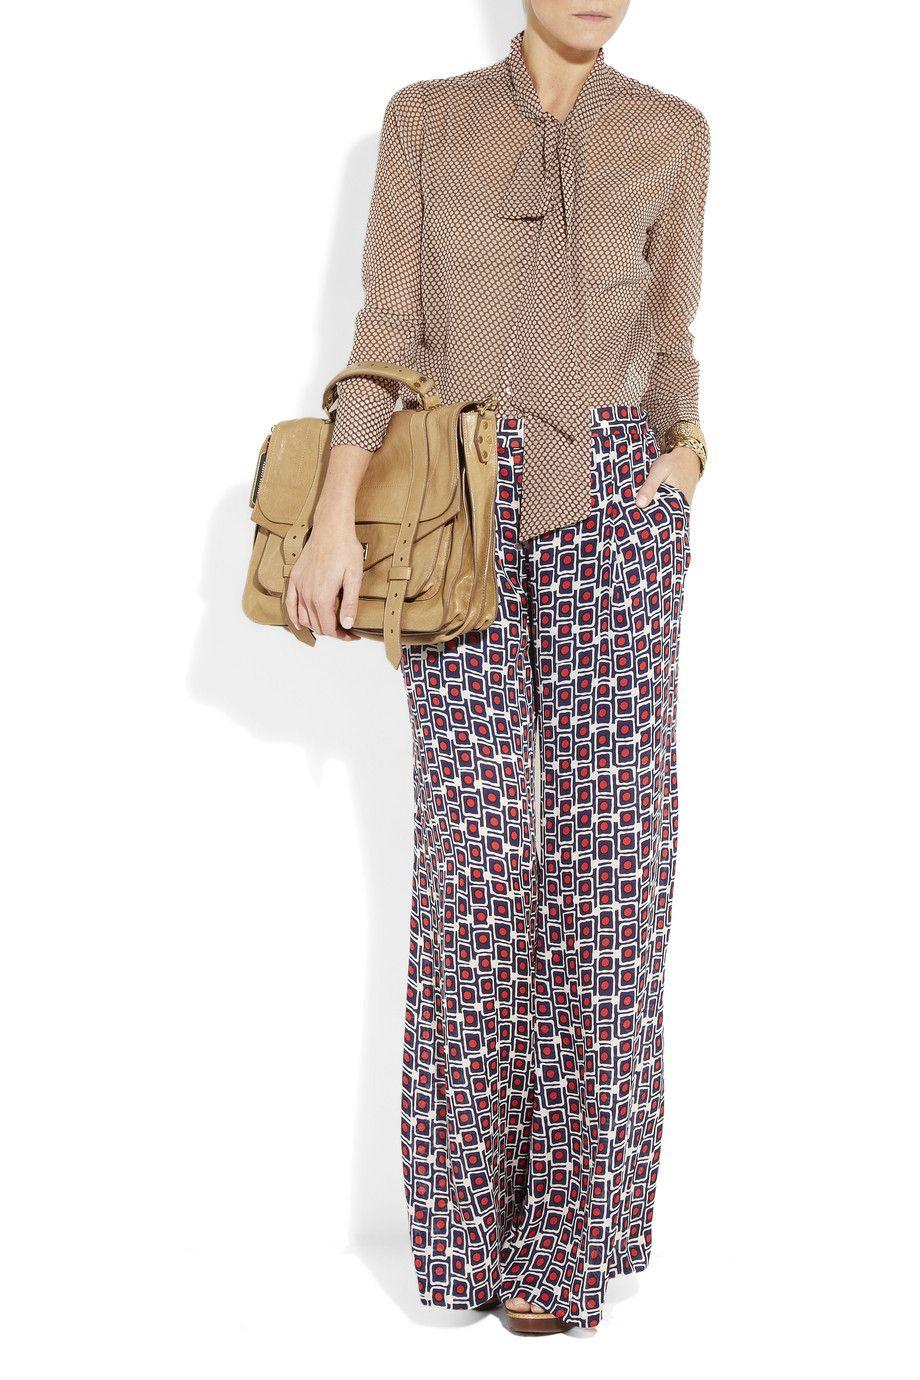 EQUIPMENT  Meredith polka-dot silk-chiffon blouse with Proenza Schouler bag.